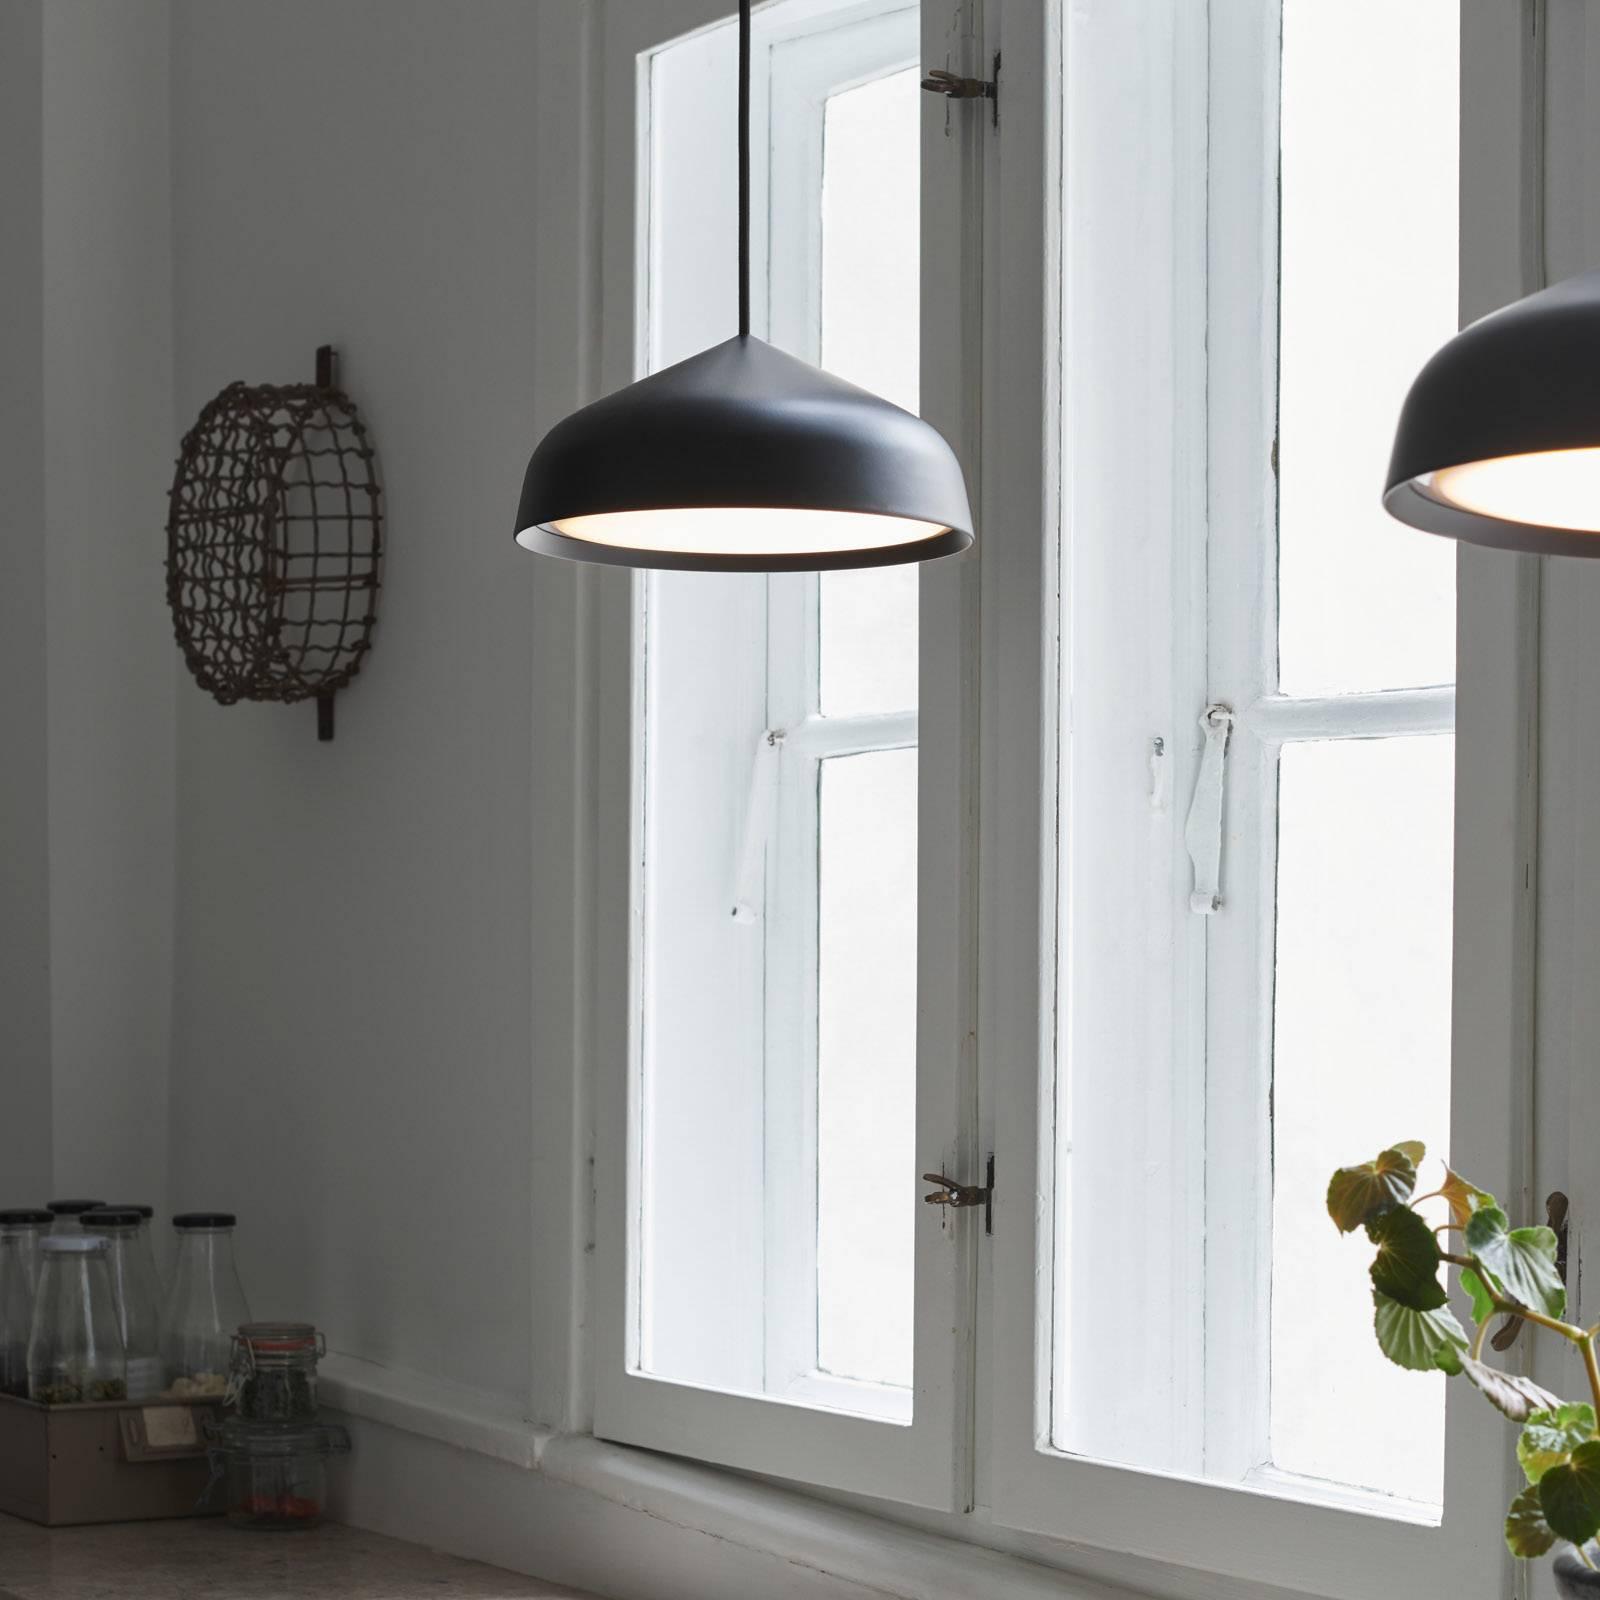 LED-riippuvalaisin Fura, 25 cm, musta